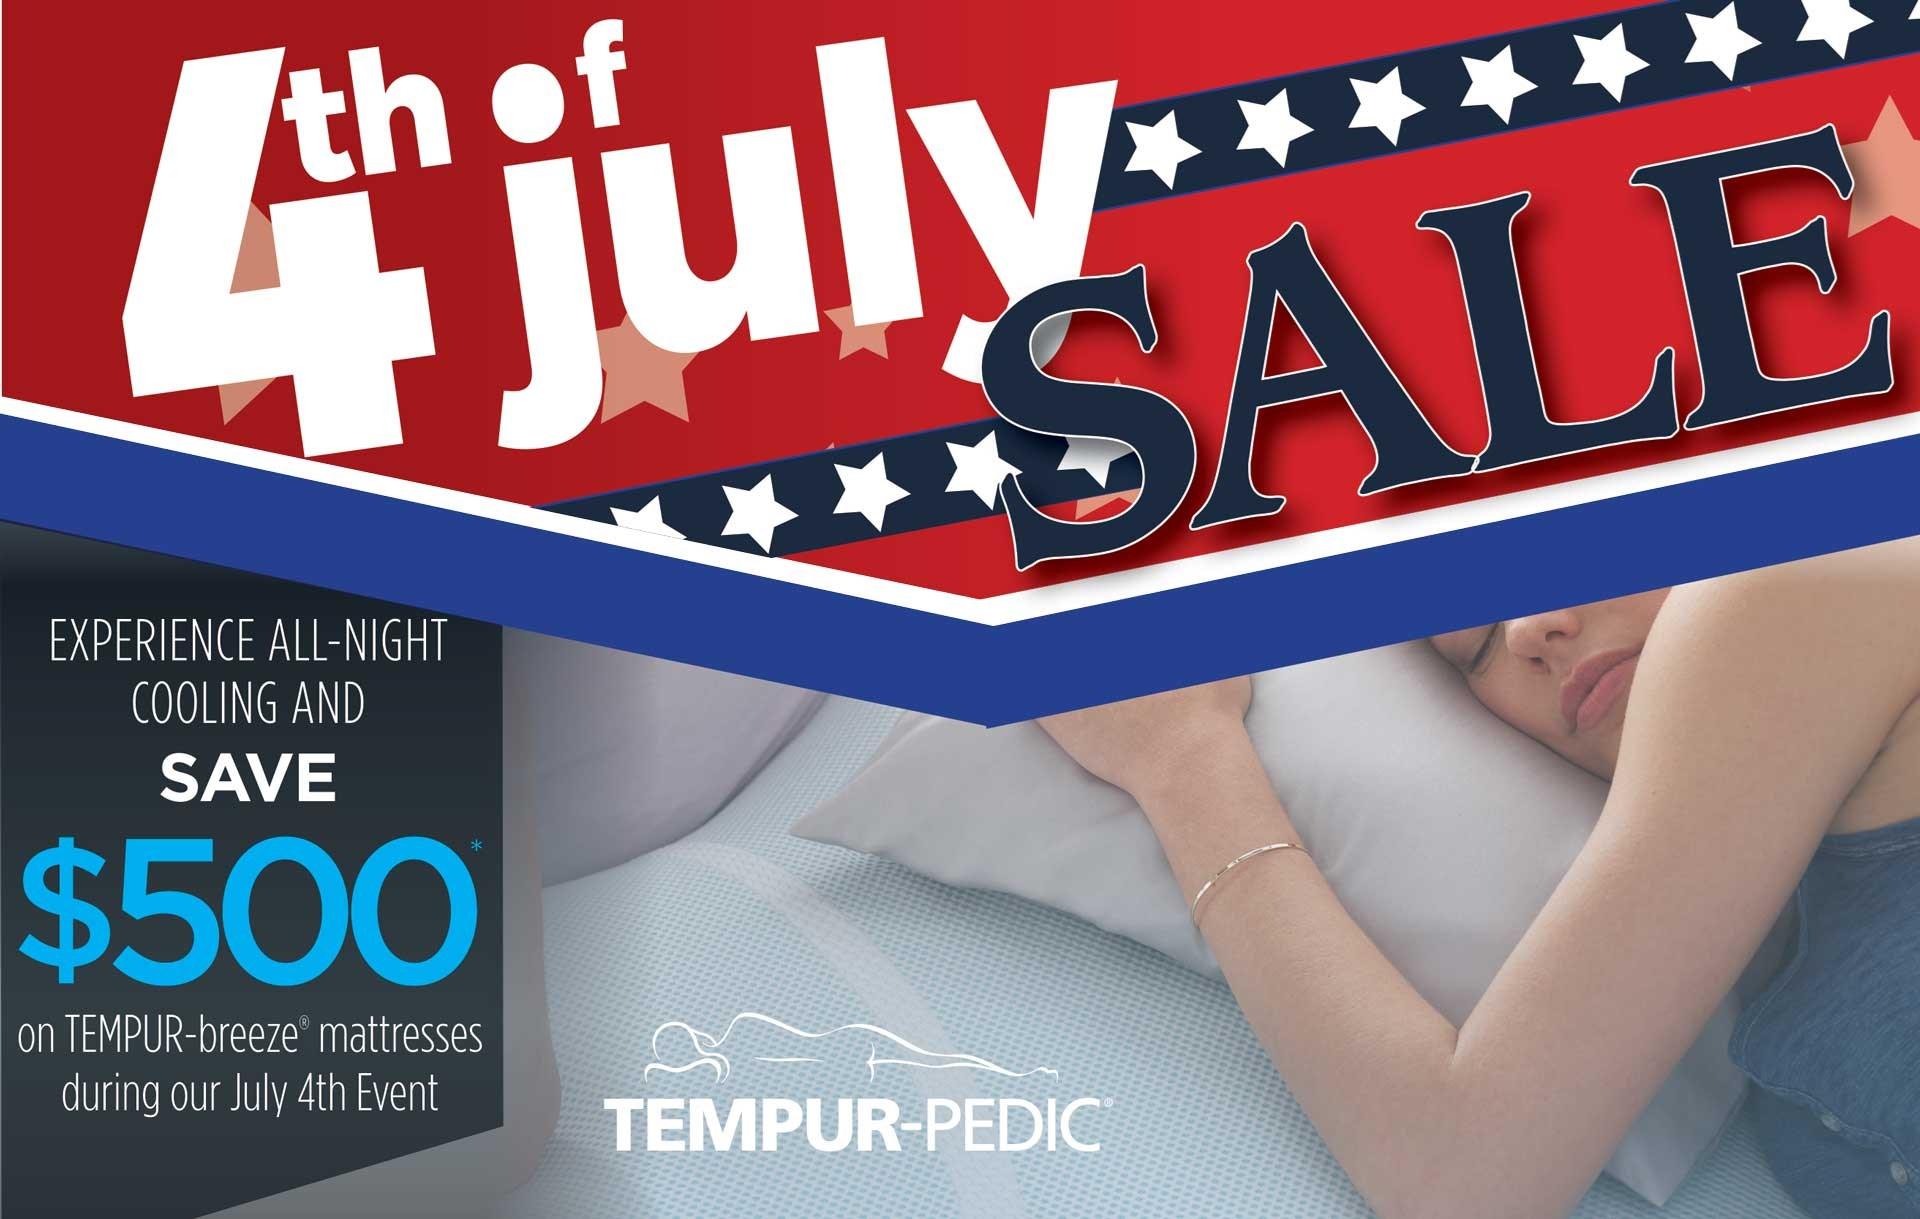 July 4th Sale! $500 Off TEMPUR-breeze mattresses